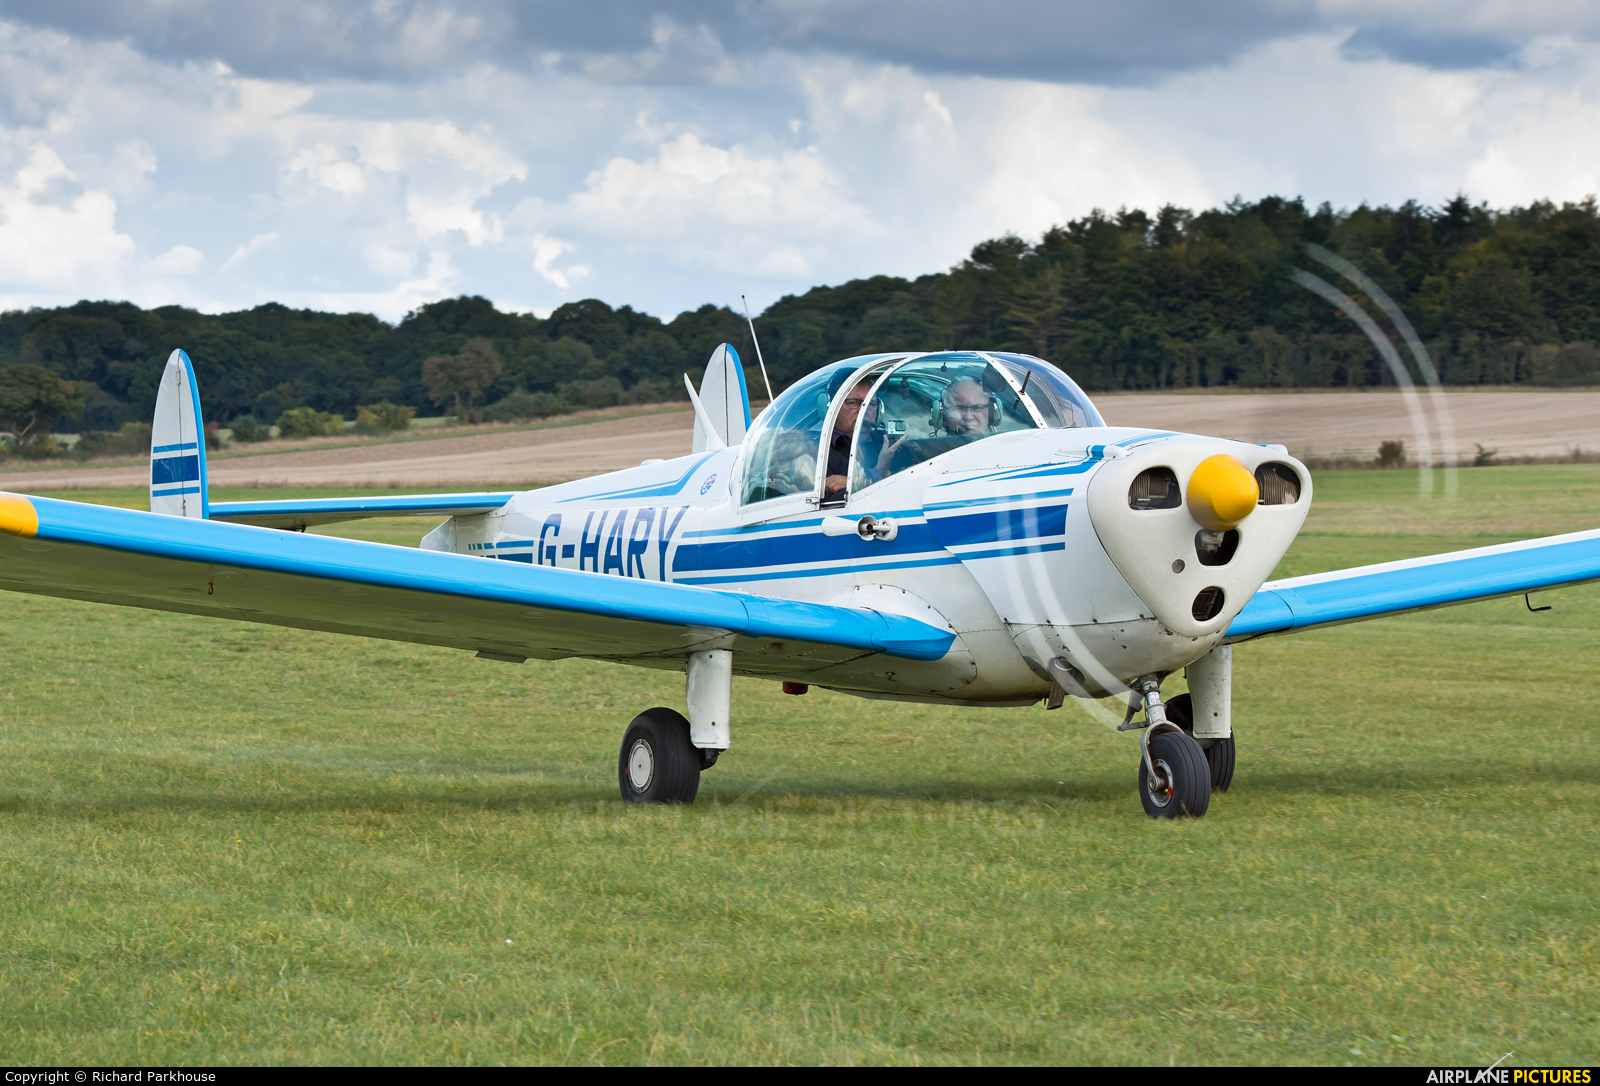 Private G-HARY aircraft at Popham